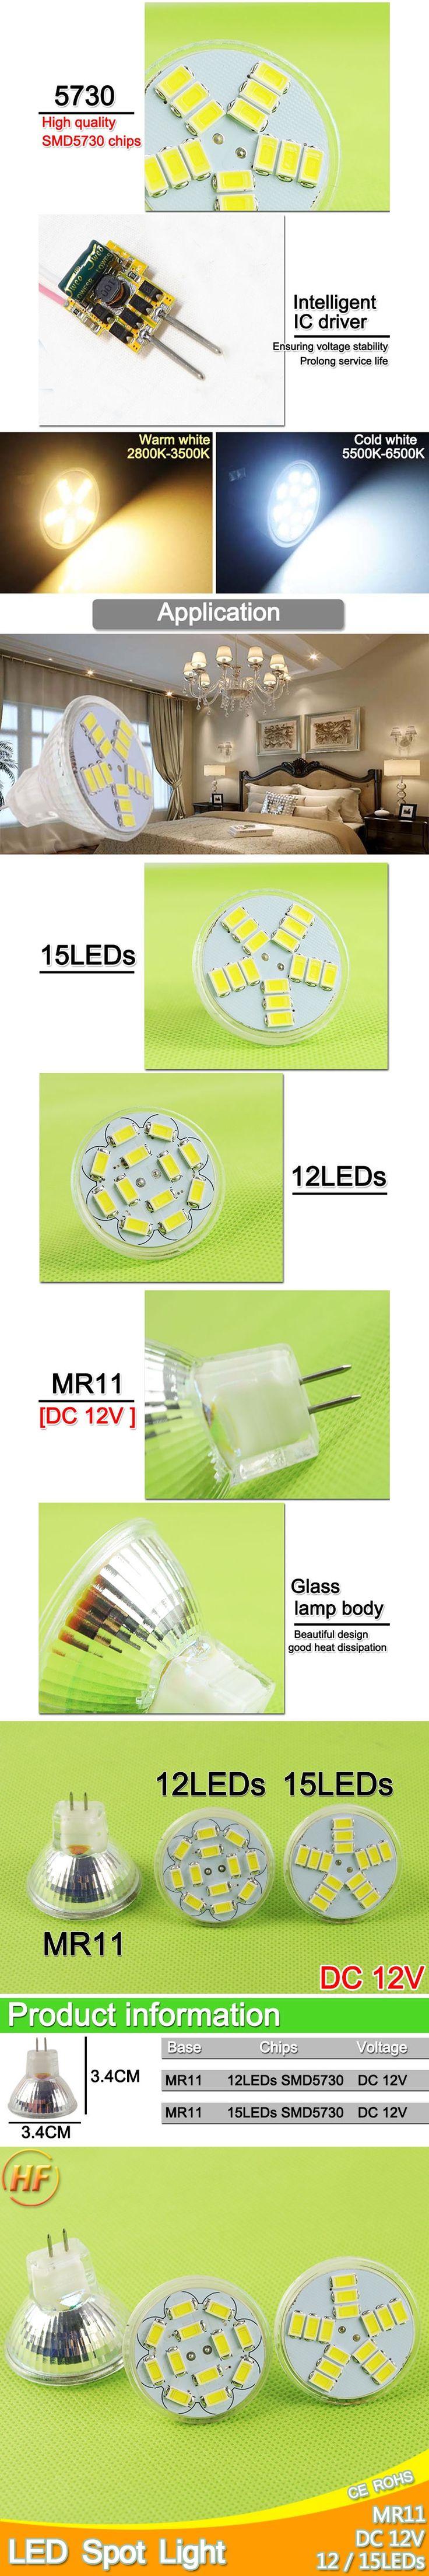 MR11 Led Spotlight DC 12V 3W 5W 5730 SMD LED Bulb Energy Saving Lamp Led Spot Light Bulb DC12v Cool White/Warm White Bombilla